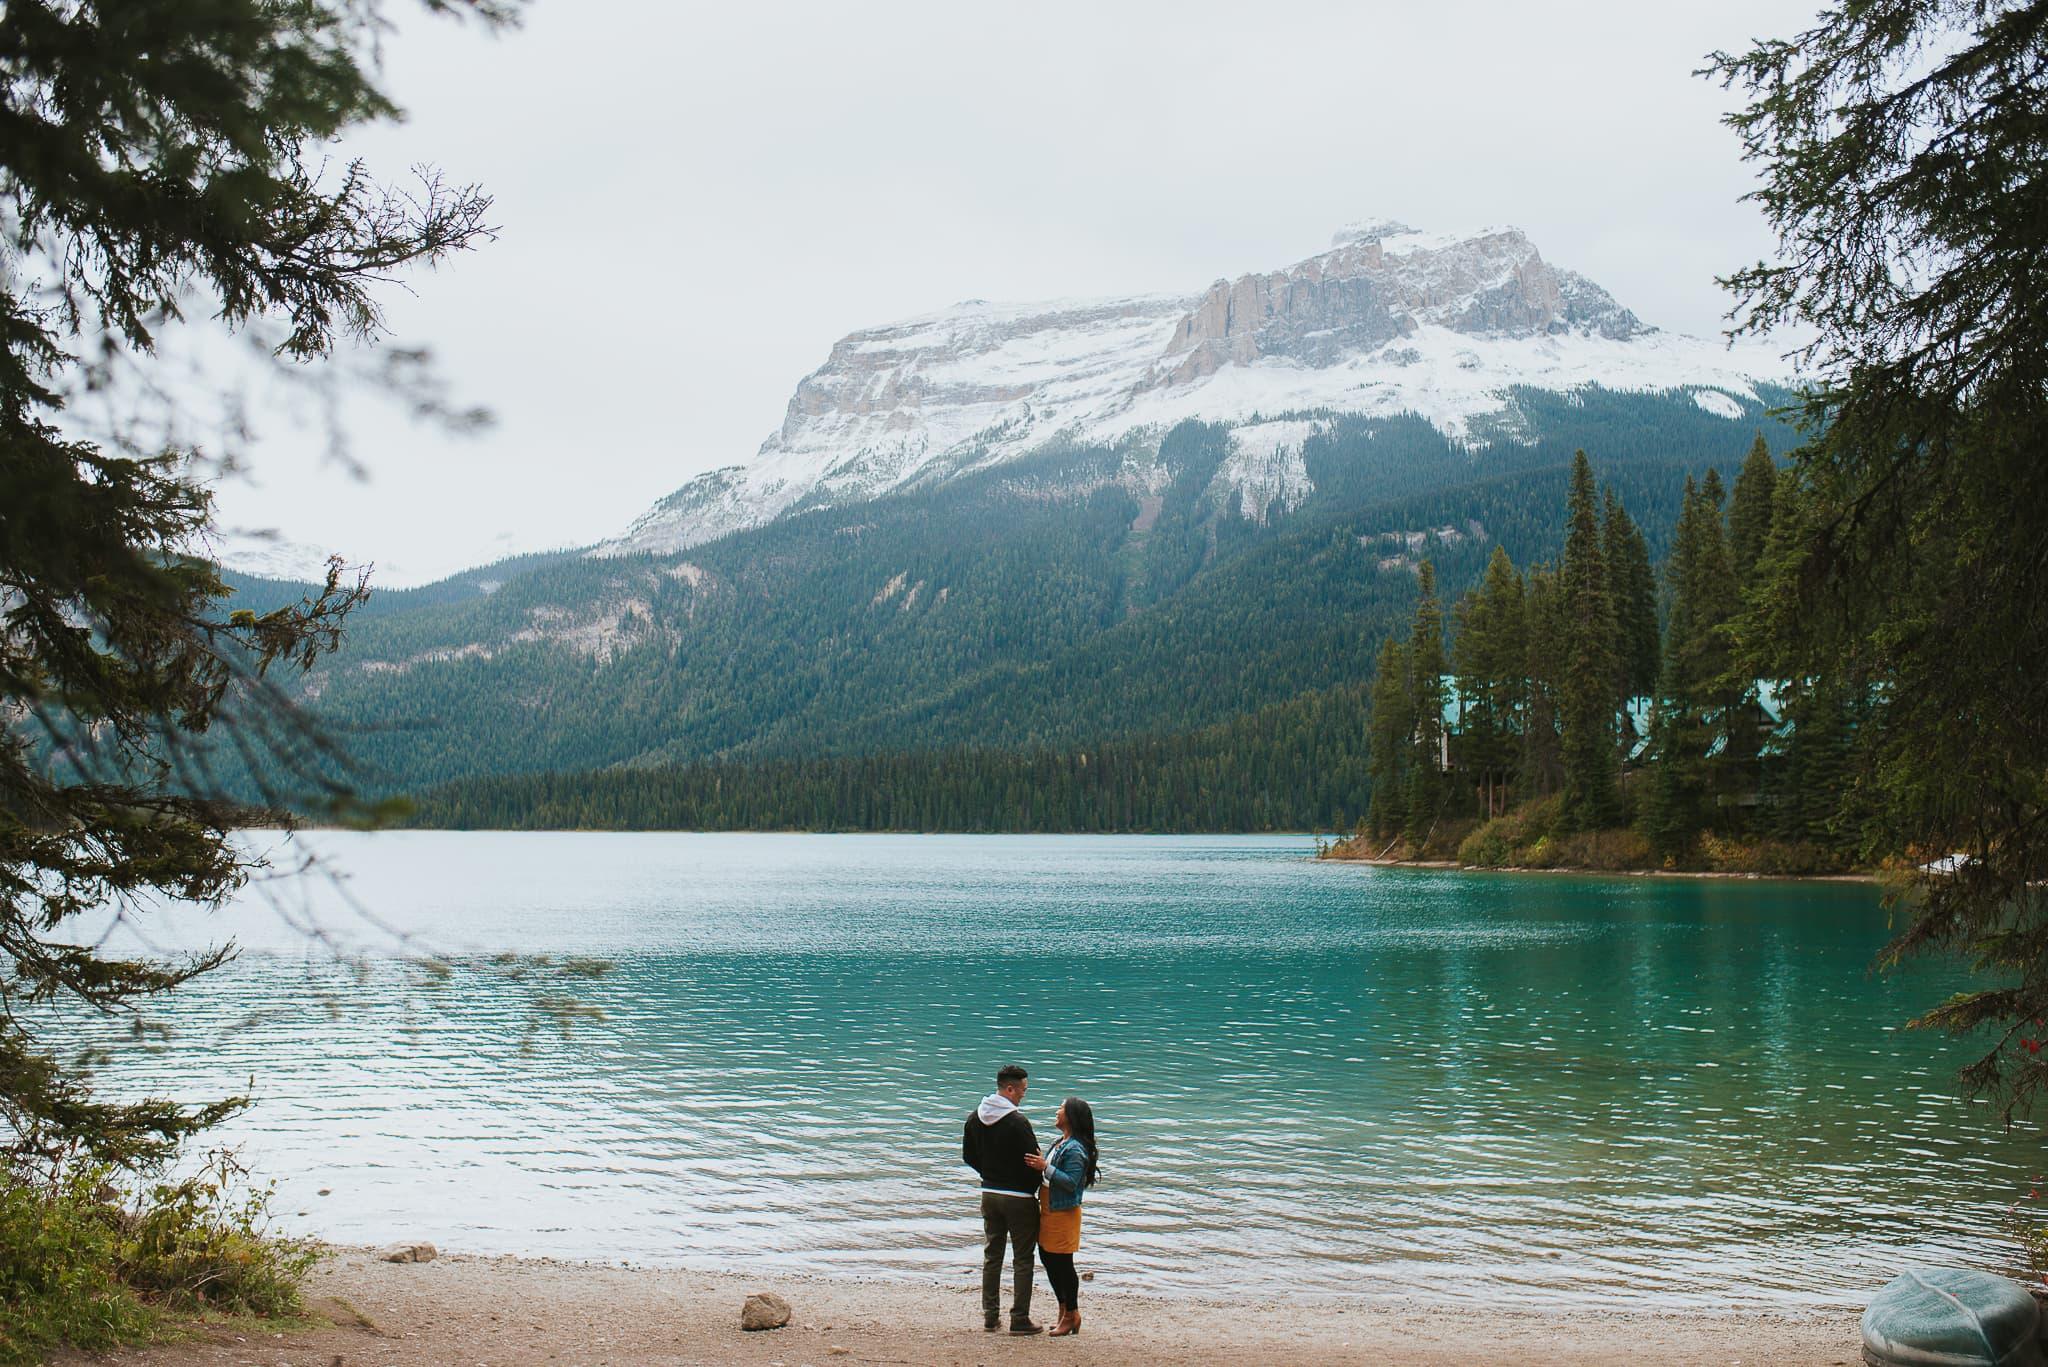 Emerald Lake photoshoot